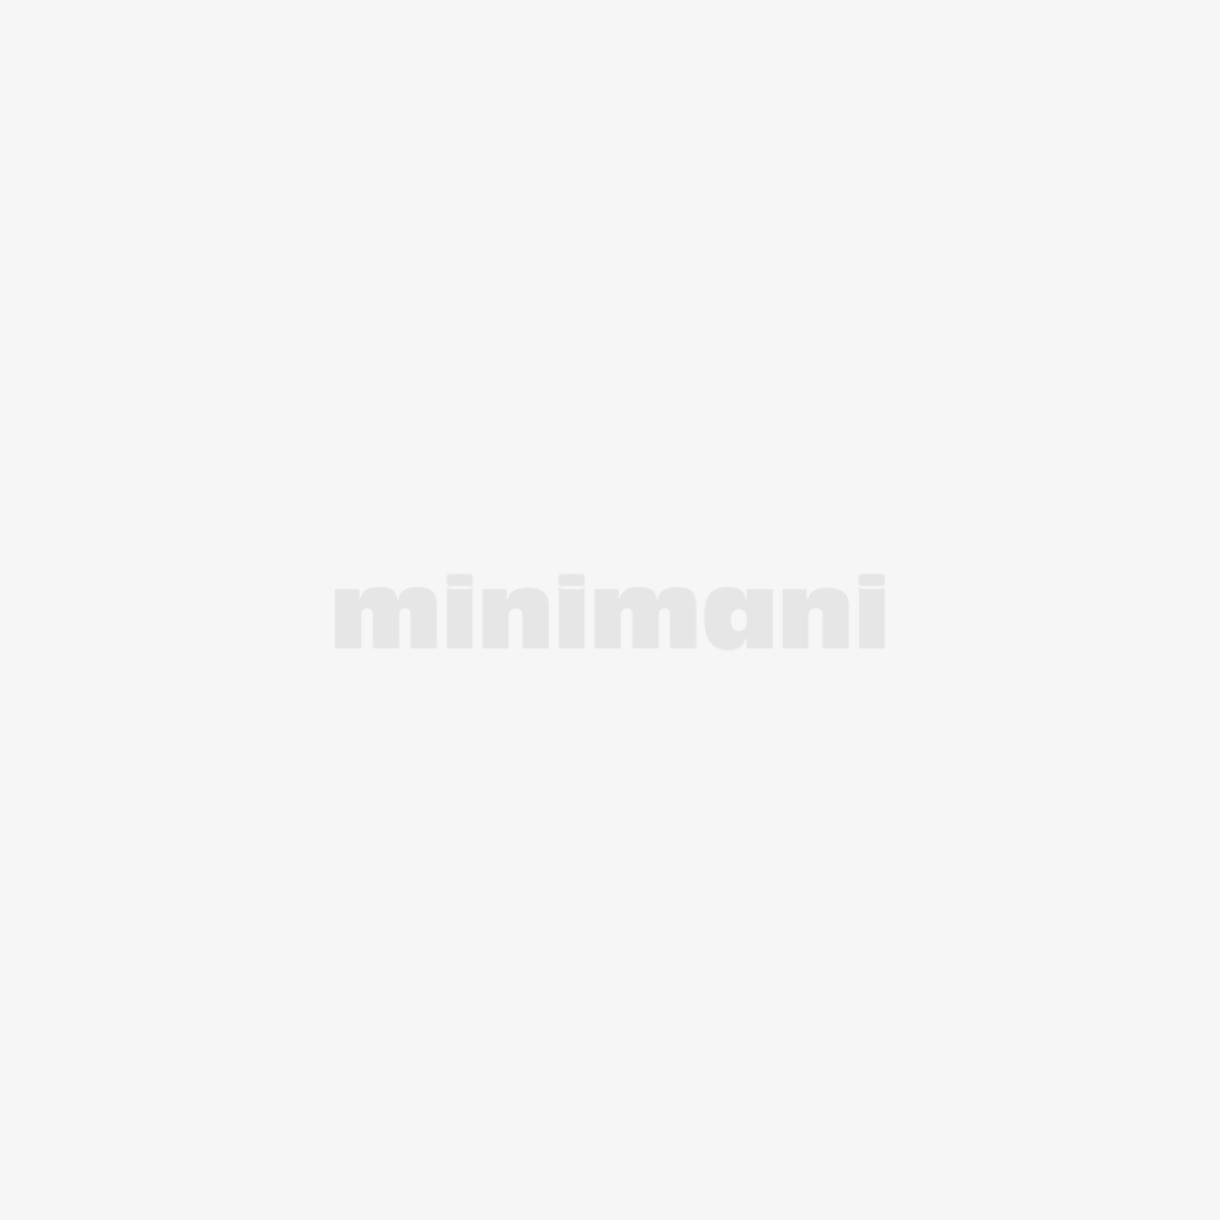 Vallila matto 68x220cm, Turtle harmaa